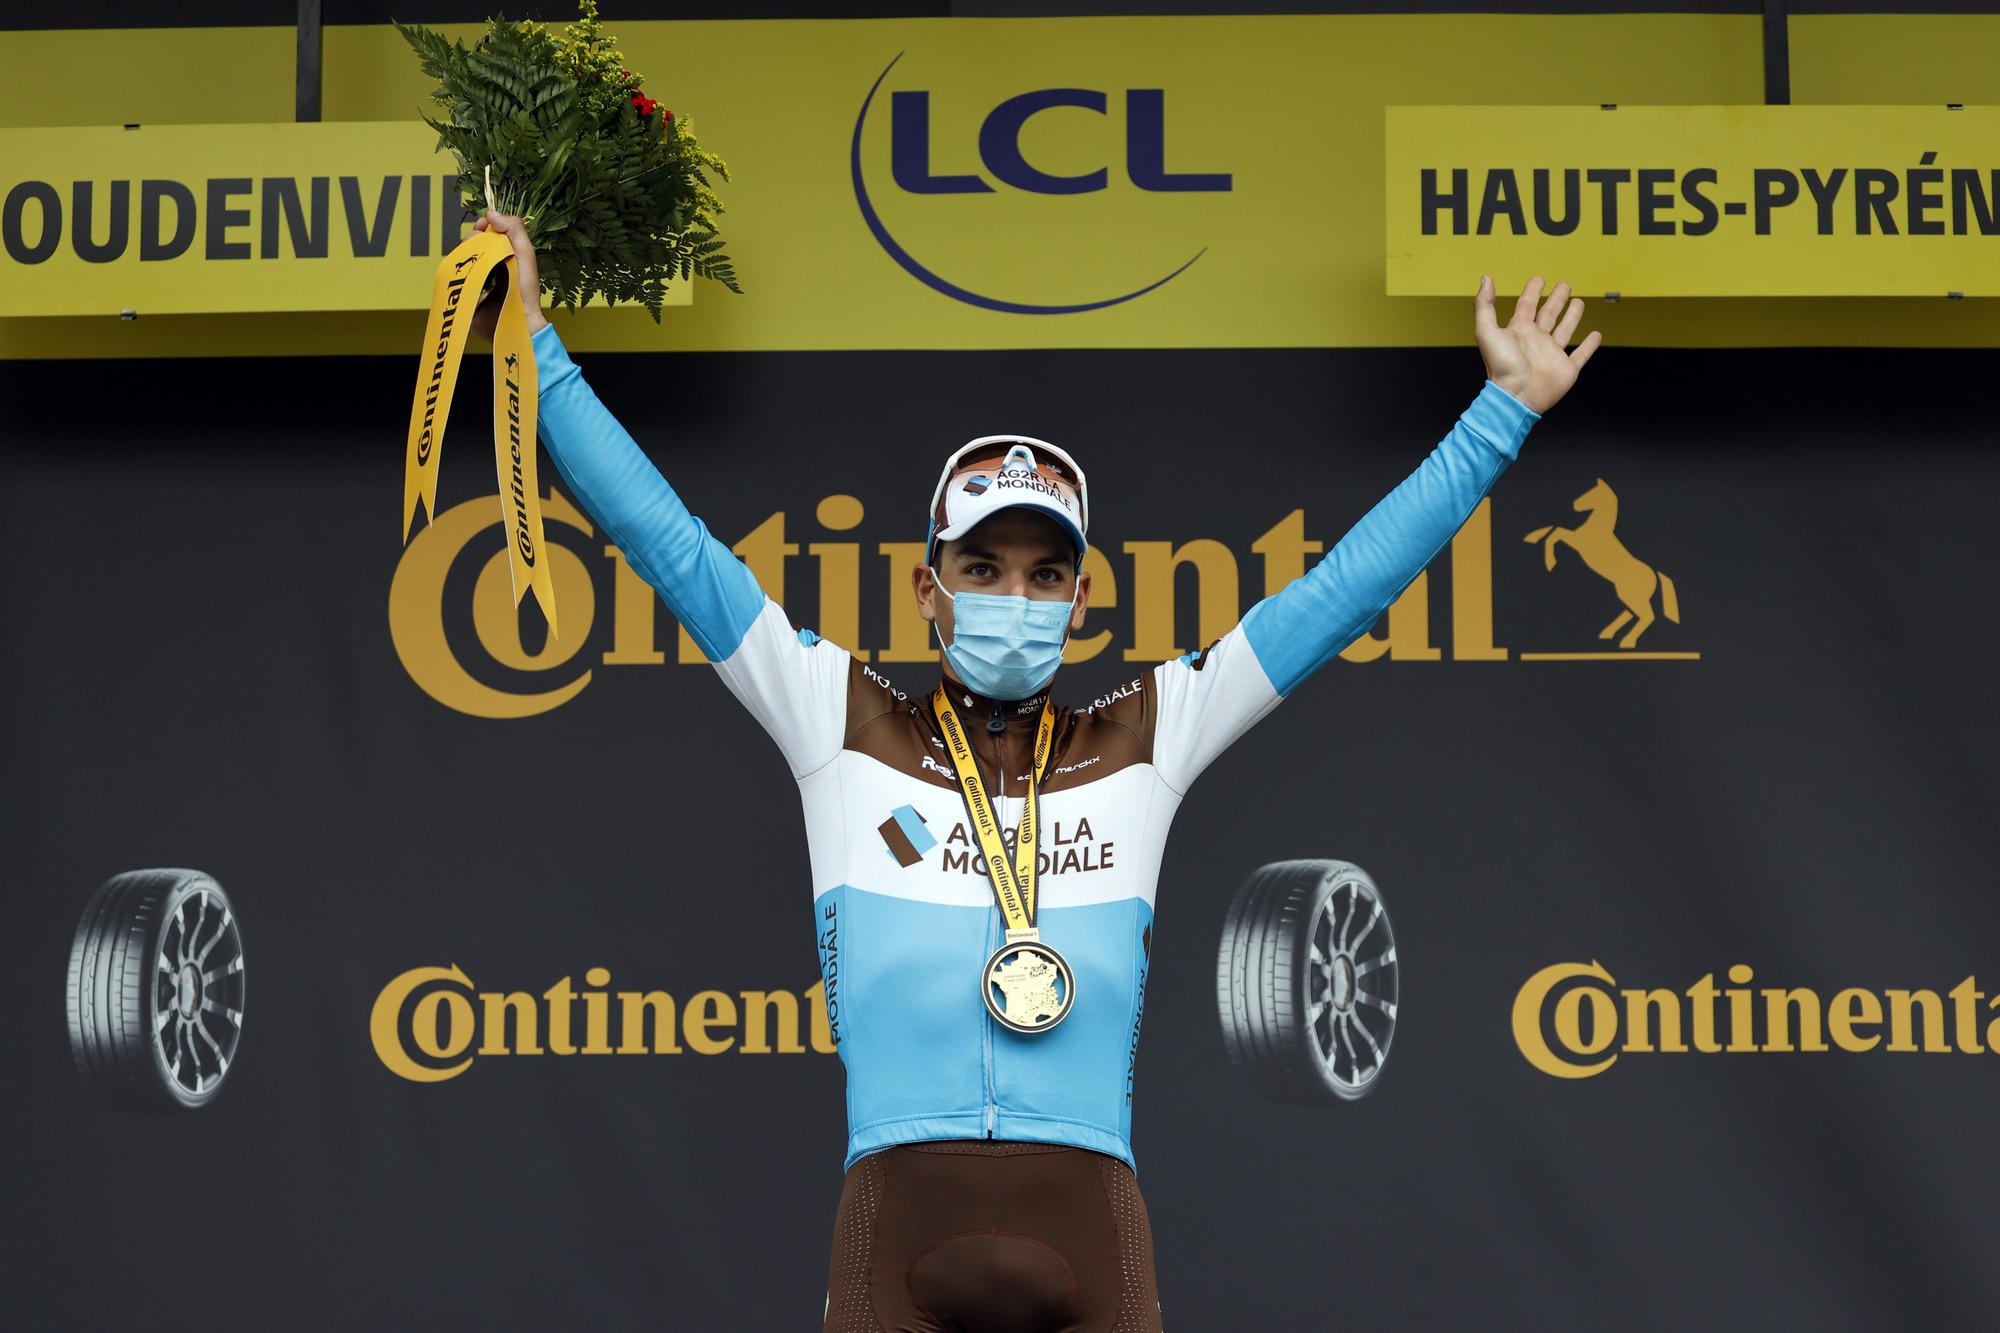 Tour de France 2020 - 107th Edition - 7th stage Cazeres - Loudenvielle 141 km - 05/09/2020 - Nans Peters (BEL - AG2R - La Mondiale) - photo POOL Sunada/BettiniPhoto©2020